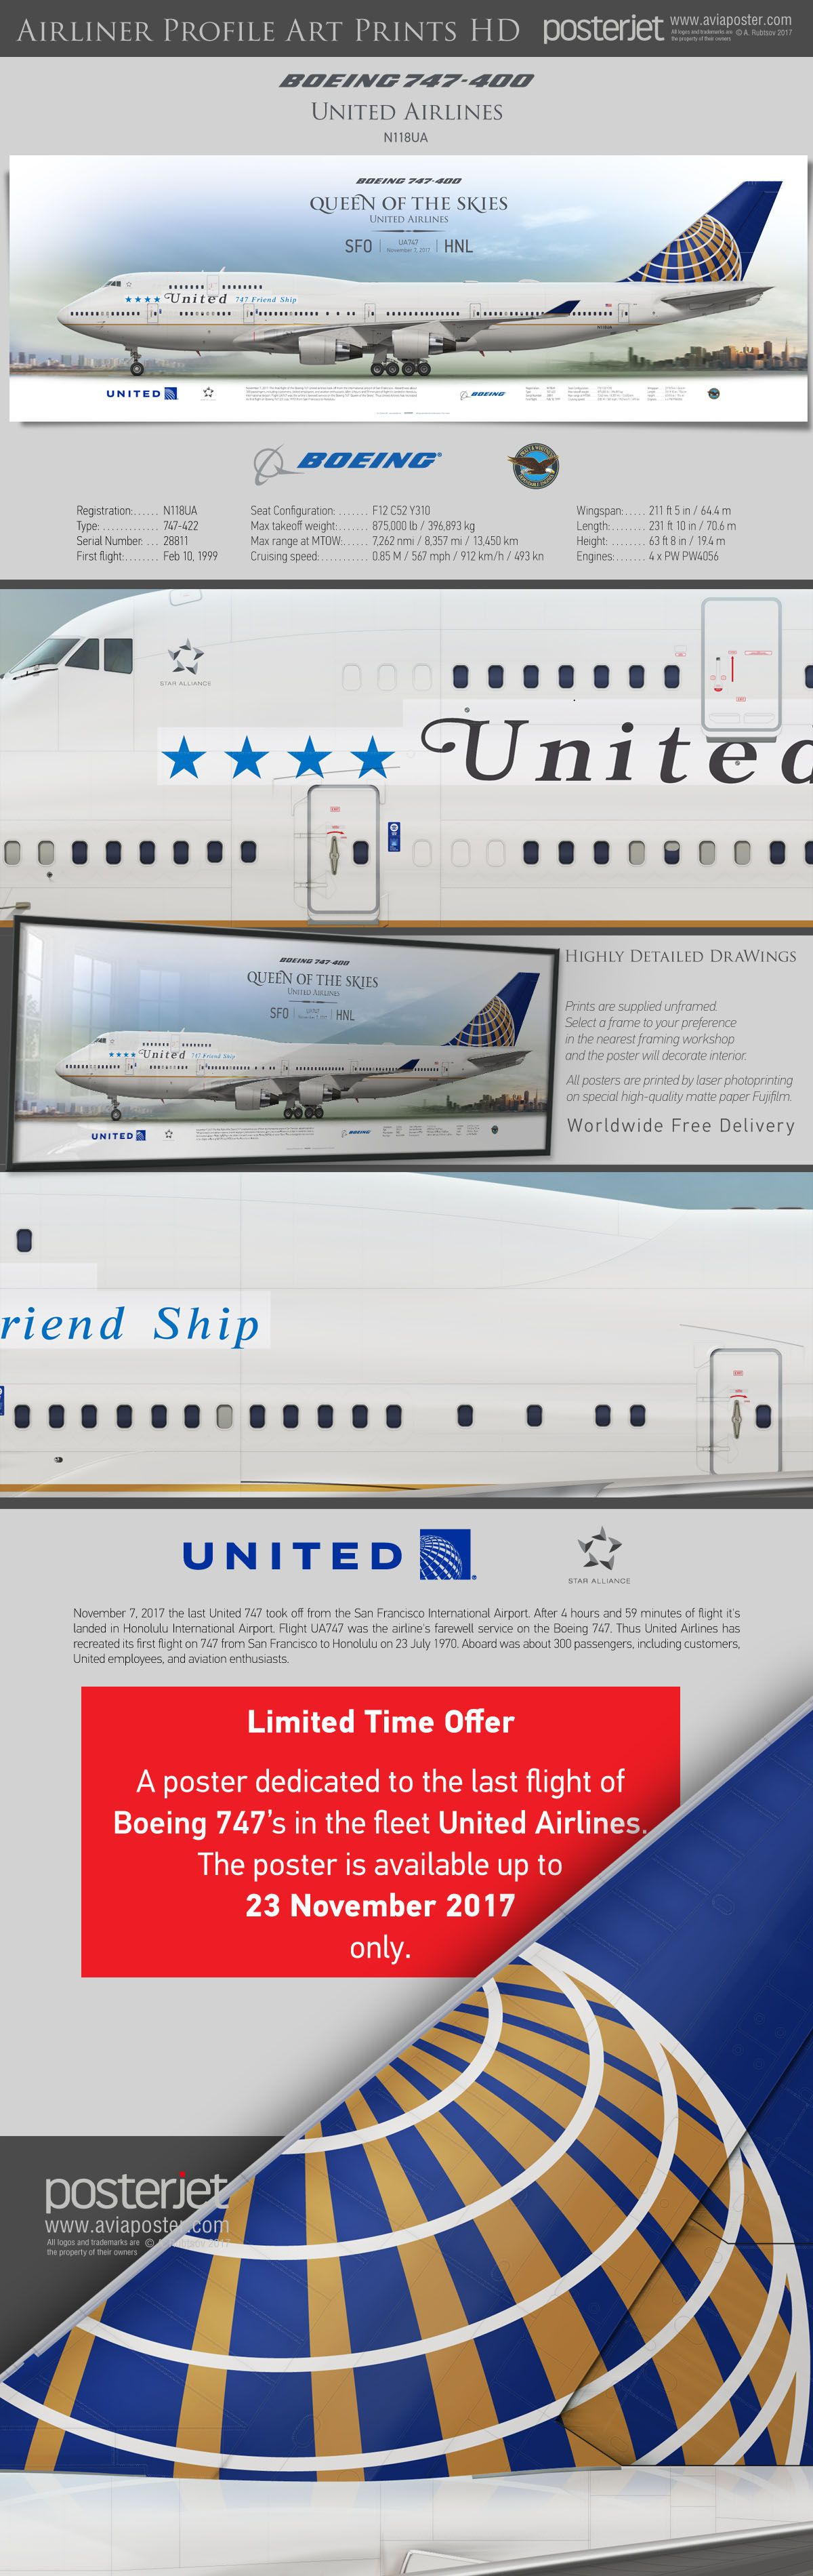 United Airlines Cargo Cargo Airlines United Air Cargo Pinterest